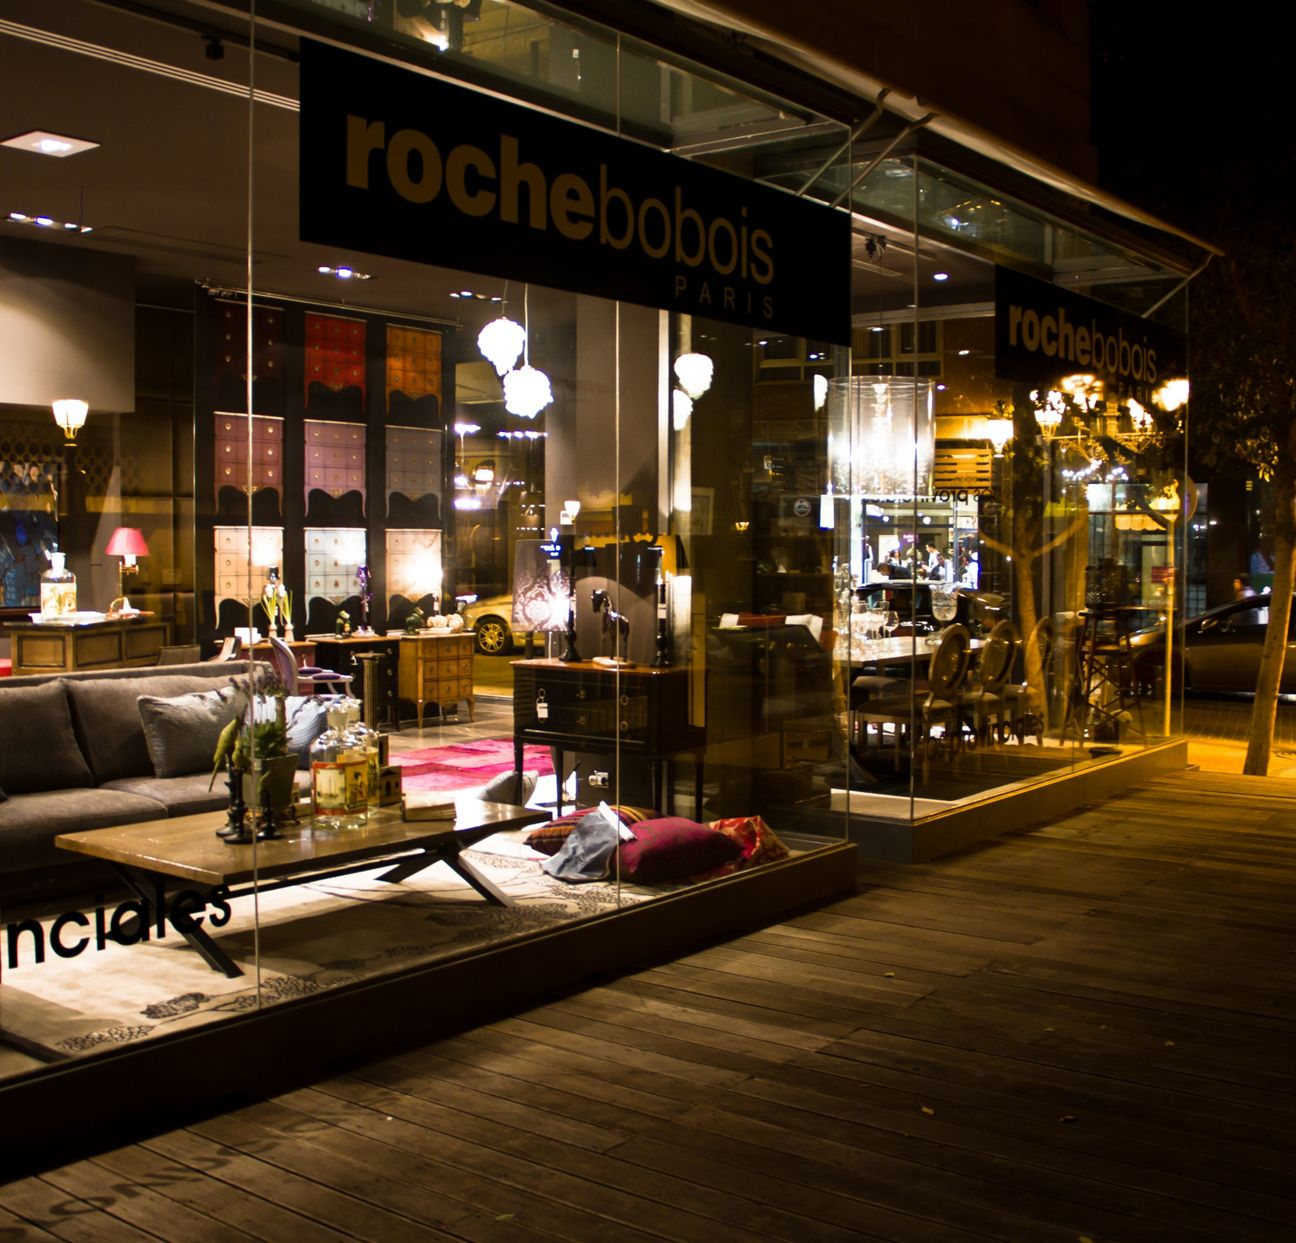 magasin roche bobois palma de mallorca 07012. Black Bedroom Furniture Sets. Home Design Ideas